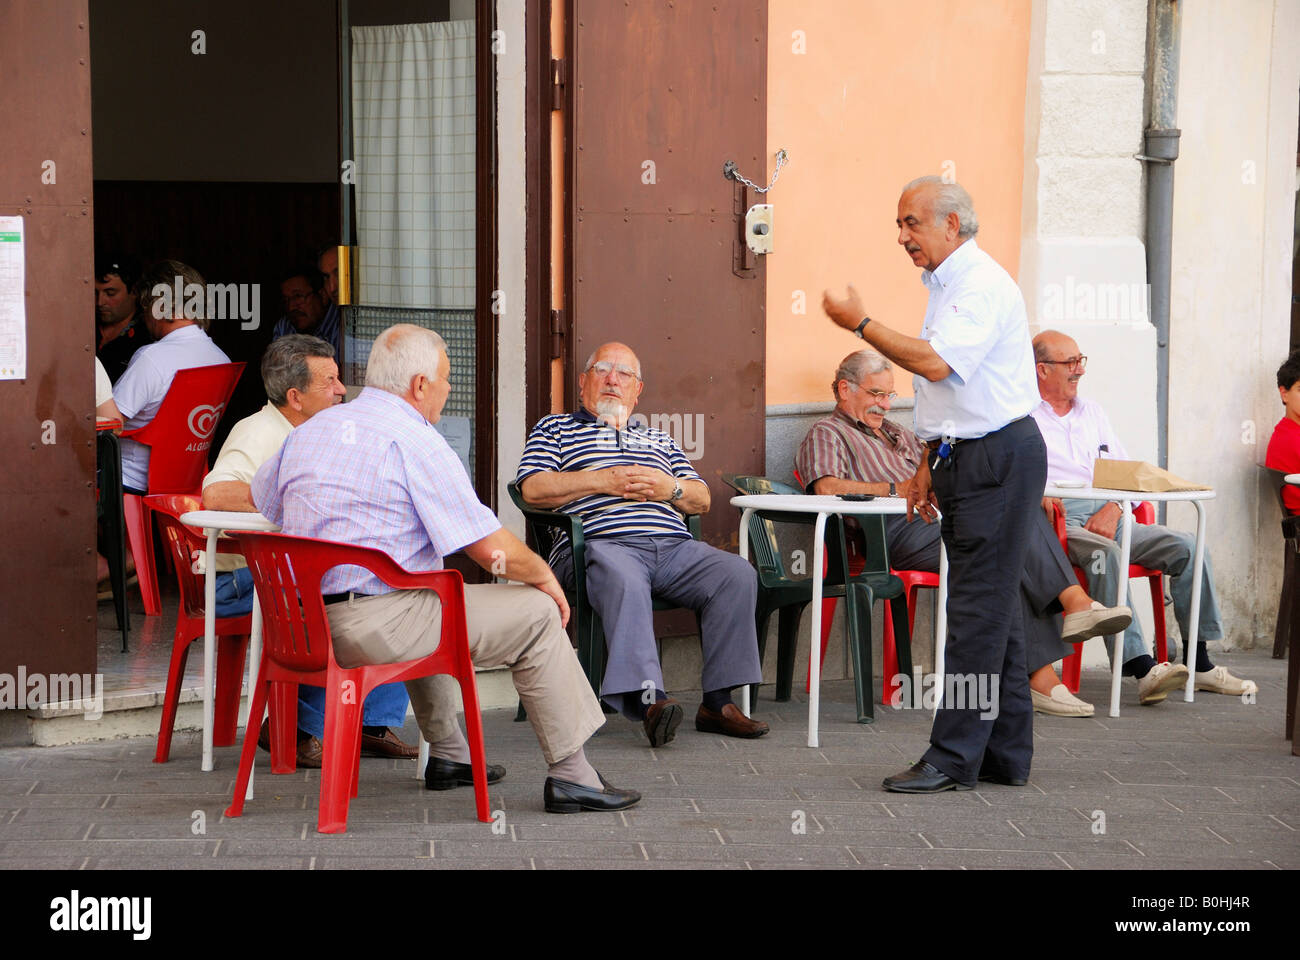 Chatting, café, Rivello, Basilicata region, province of Potenza, South Italy, Italy, Europe - Stock Image